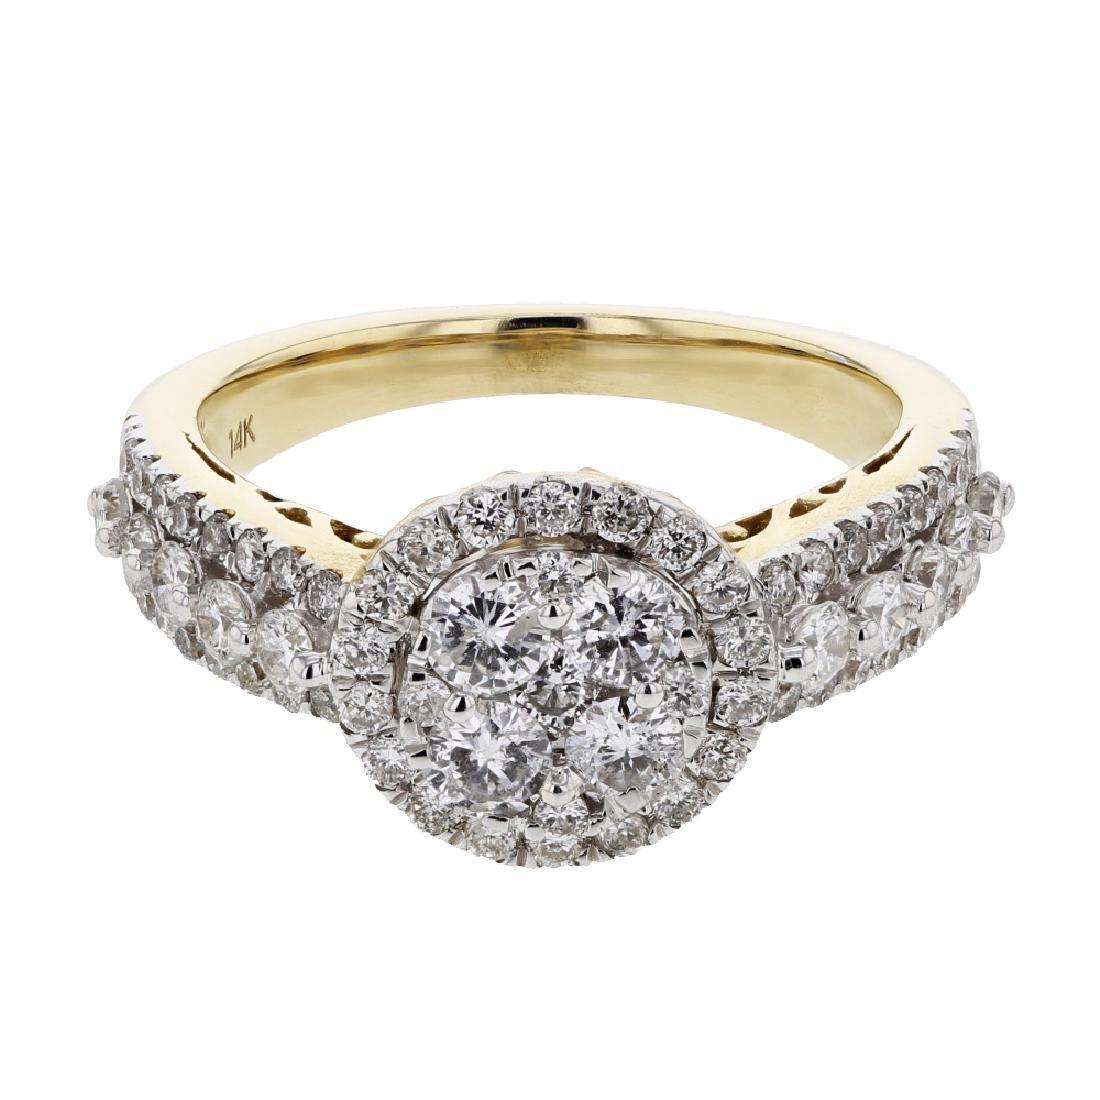 1.31 CTW Diamond Cluster Ring 14K Yellow Gold -